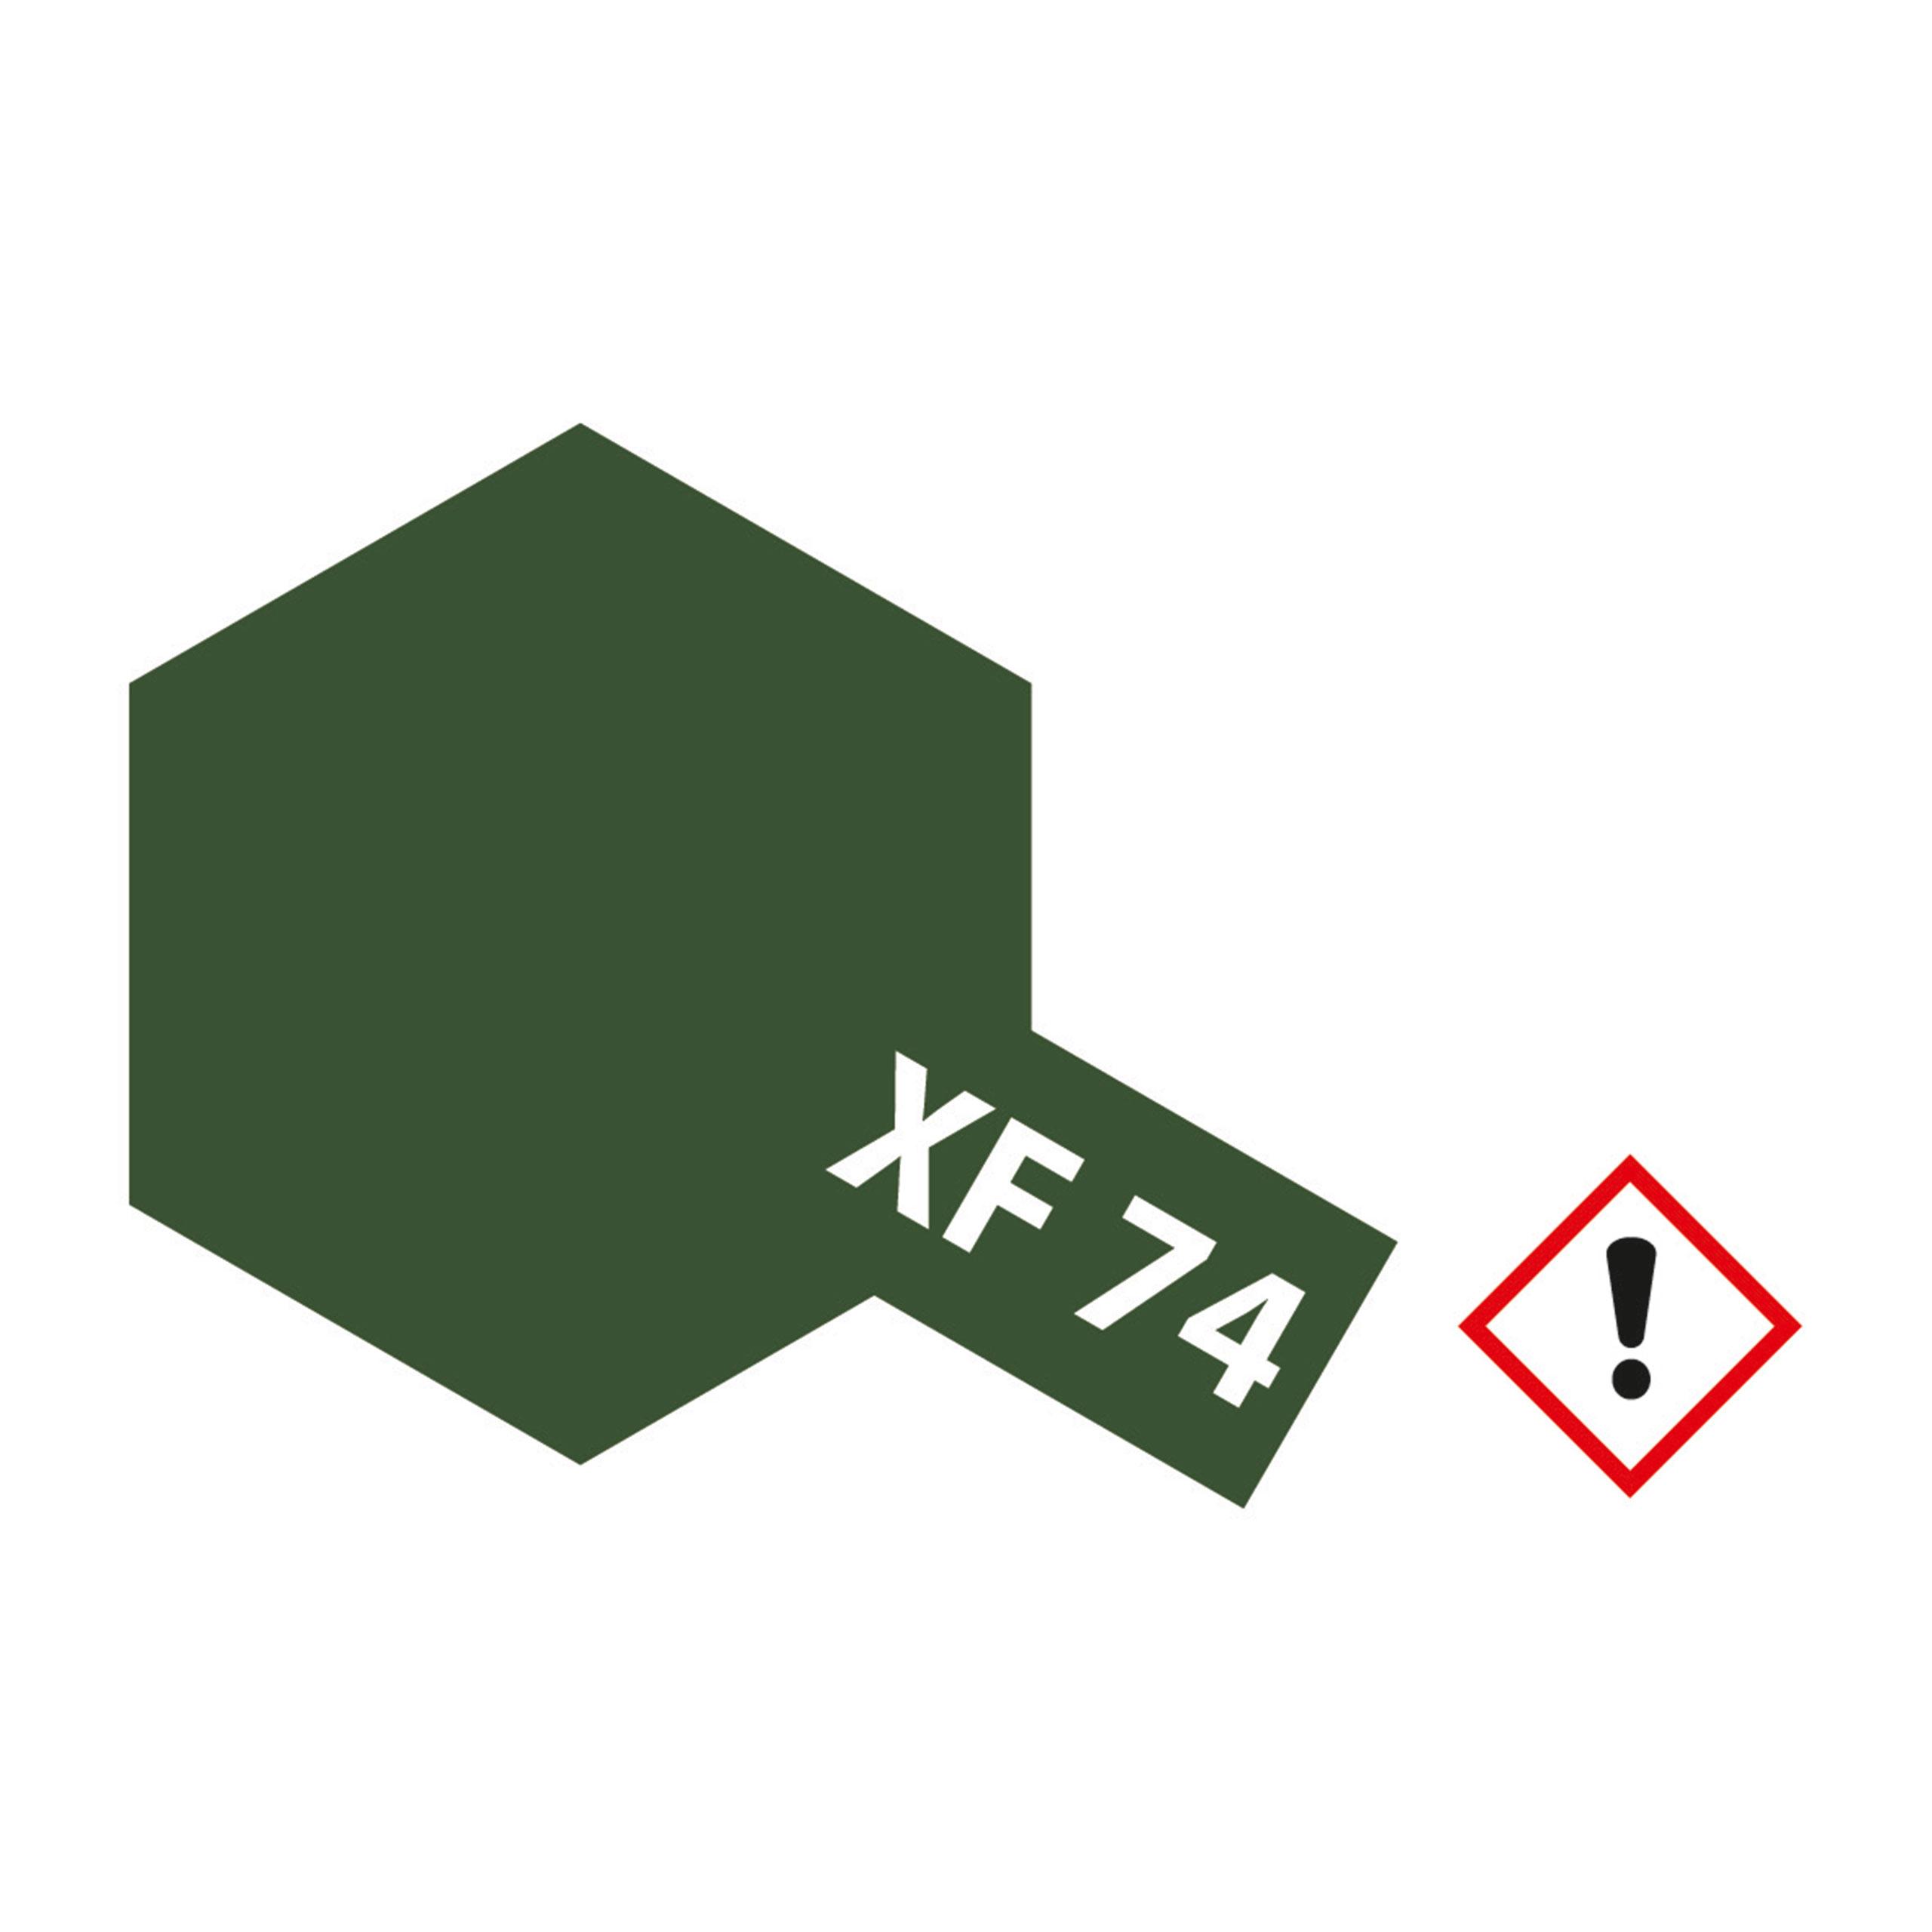 XF-74 Braunoliv Oliv Drab matt - 10ml Acrylstreichfarbe wasserloeslich Tamiya 300081774